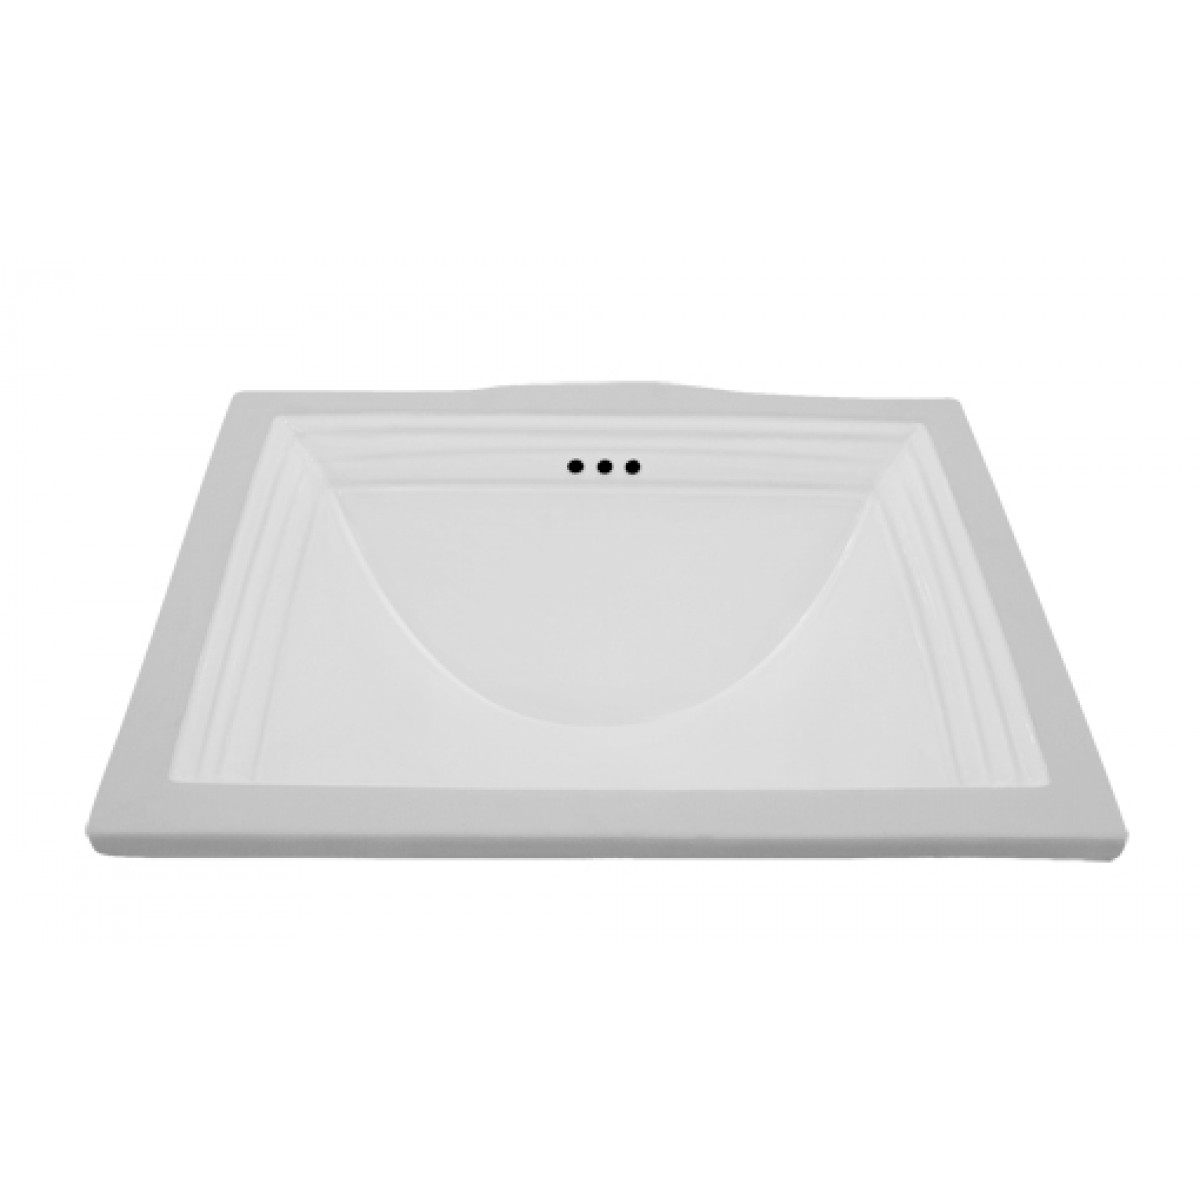 Rectangular White Porcelain Ceramic Vanity Undermount